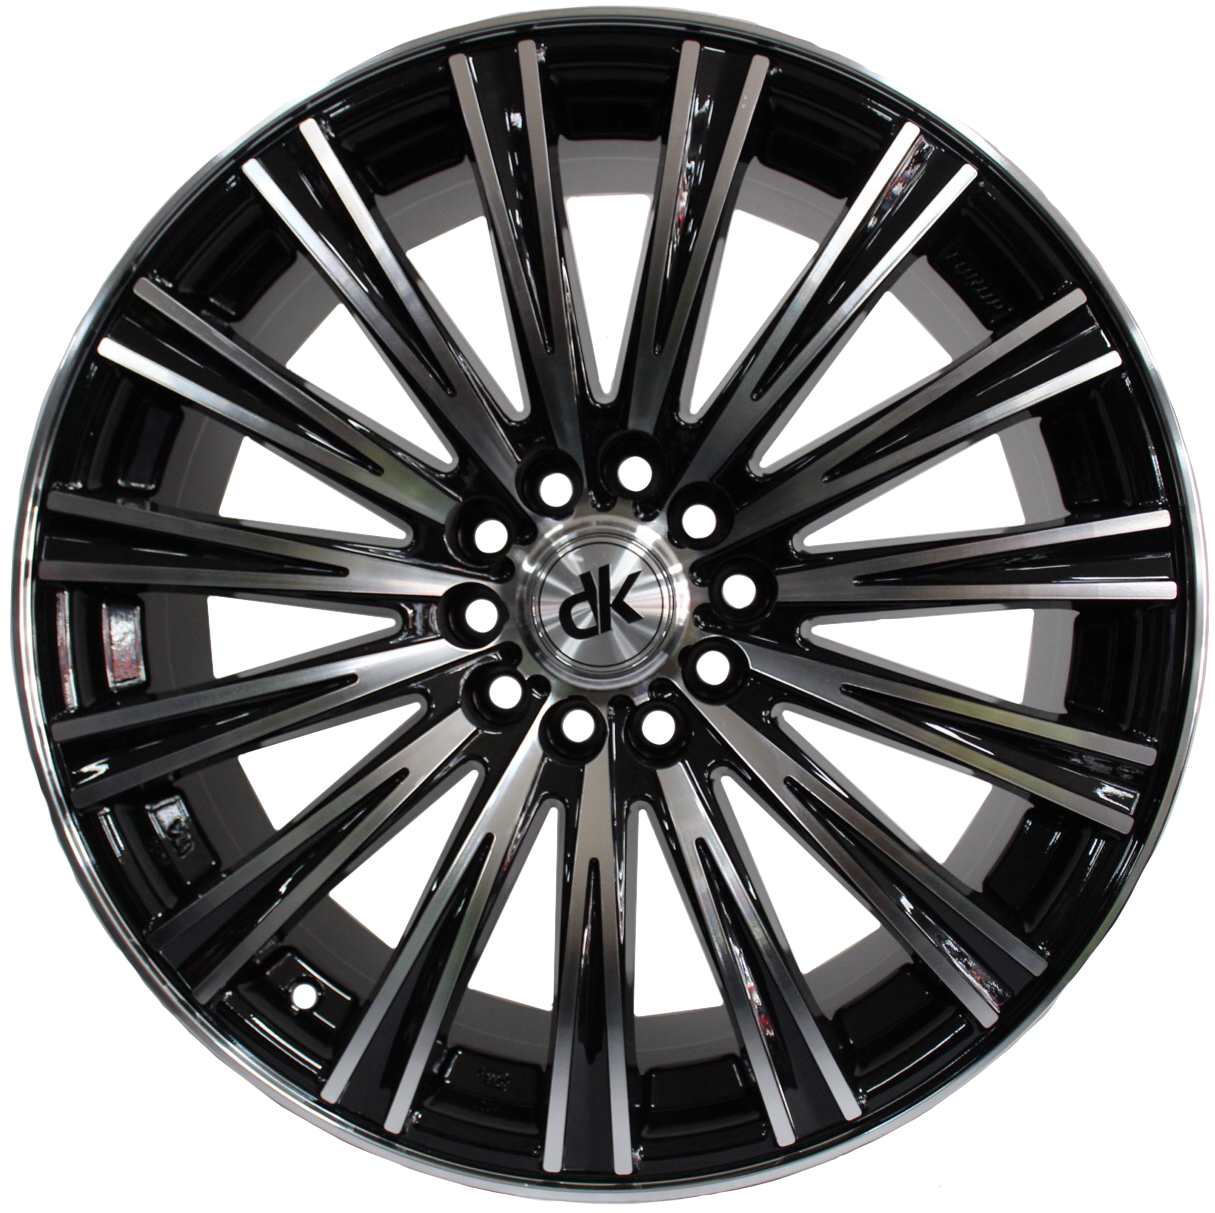 DK Wheels - 109 (Black Polished)